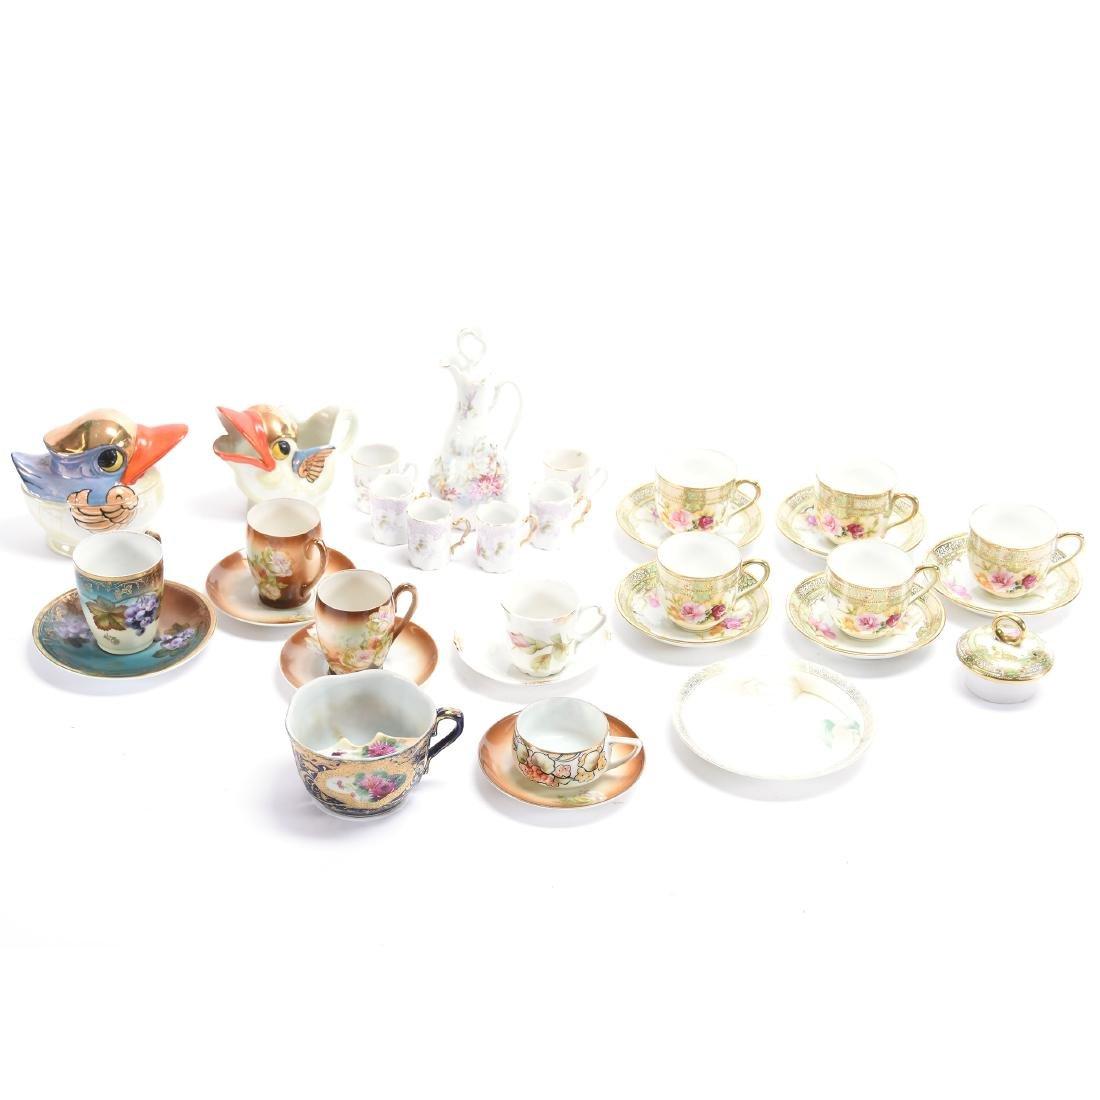 (25) Assorted Porcelain Items